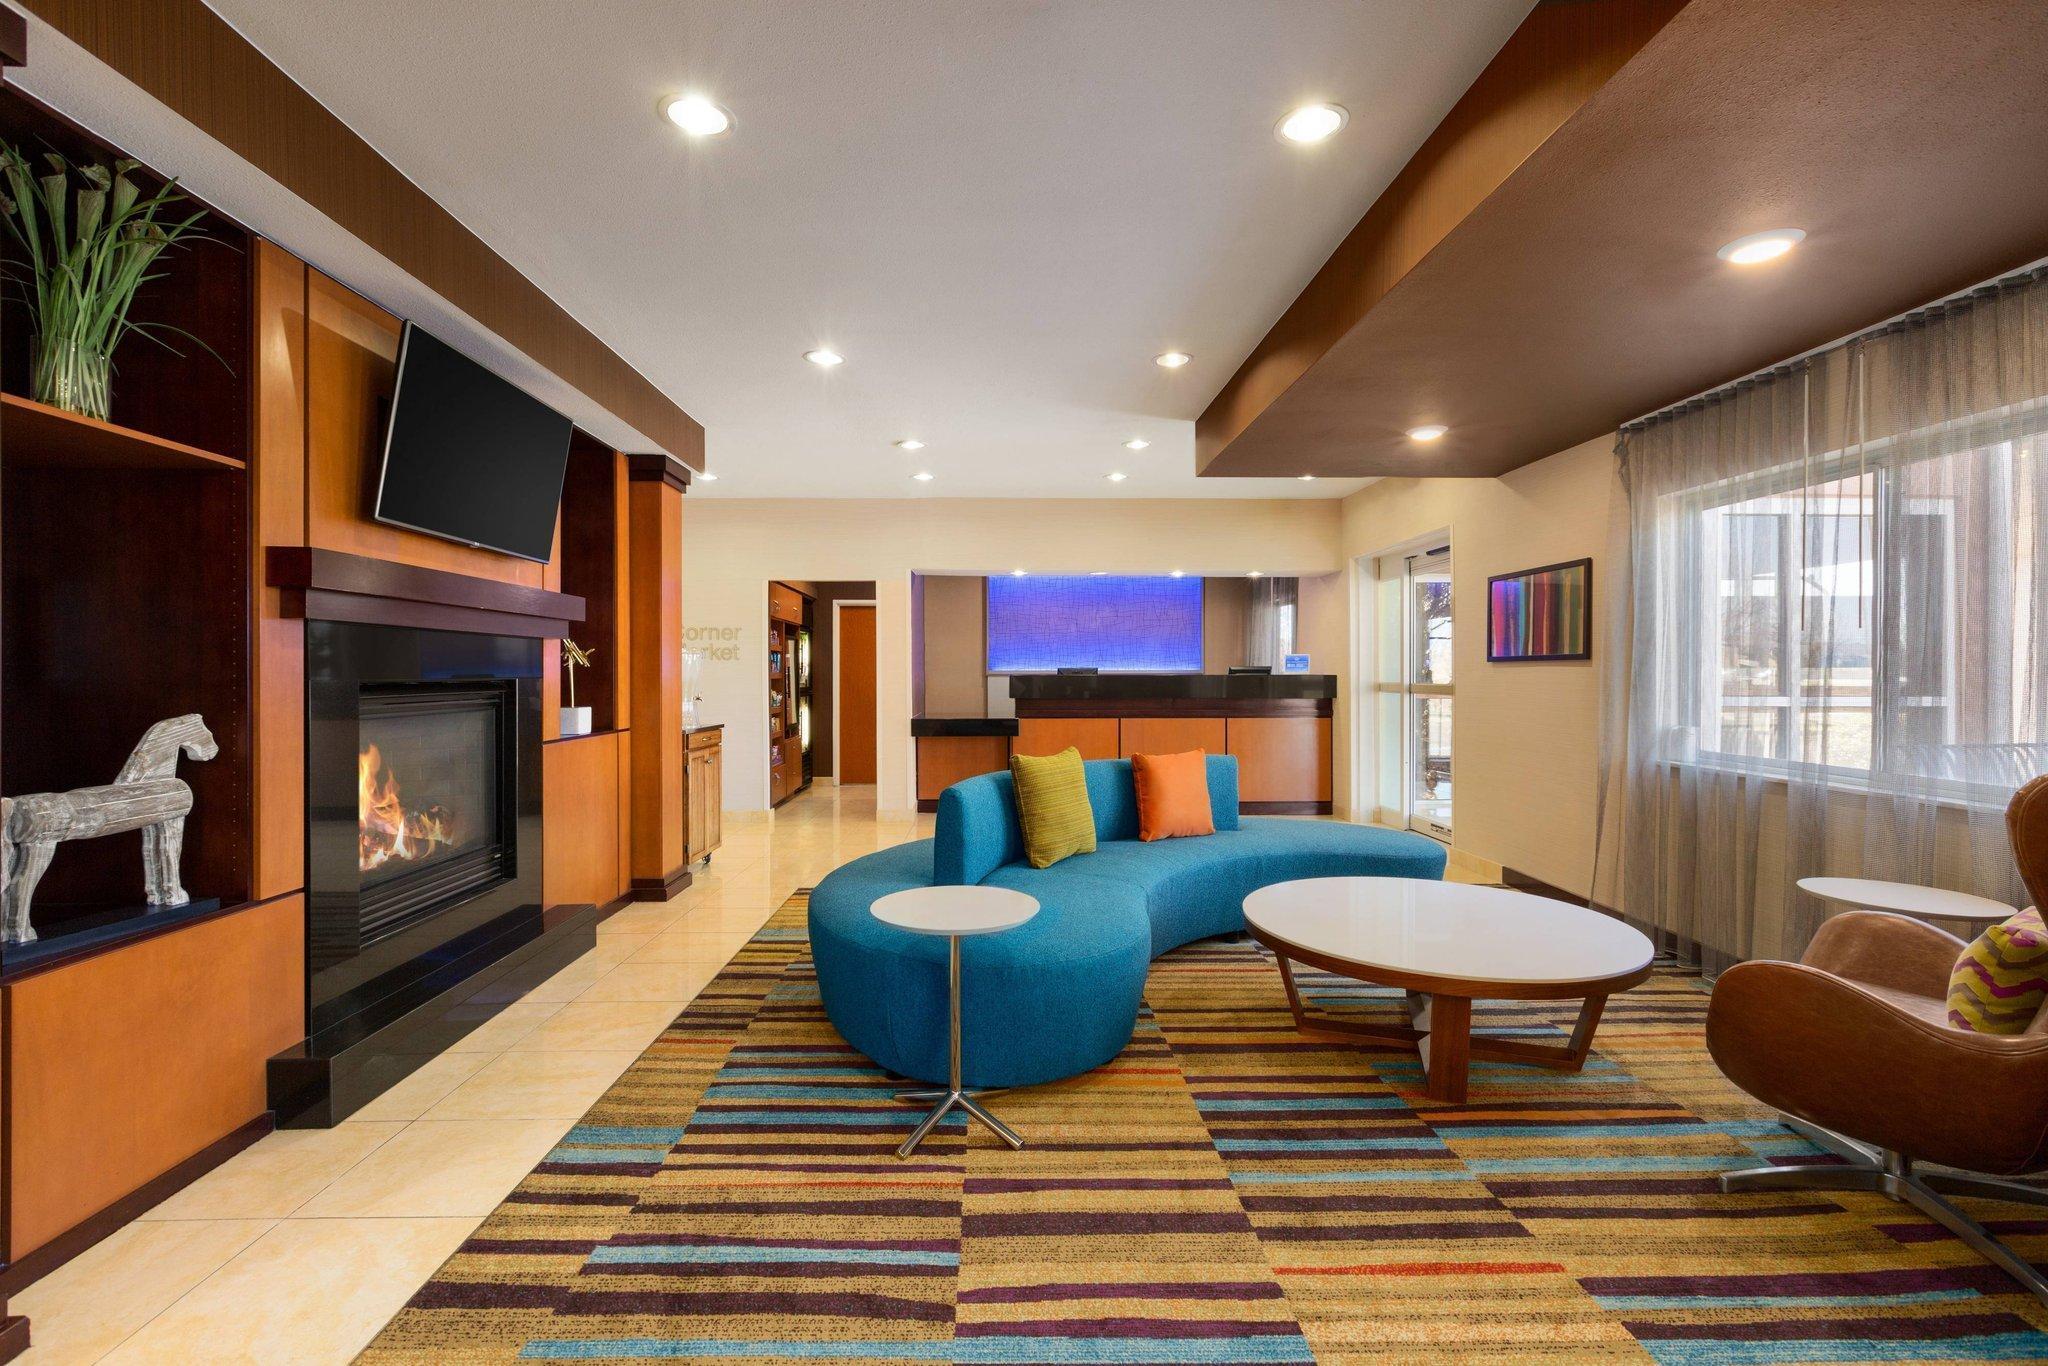 Fairfield Inn & Suites Amarillo West Medical Center